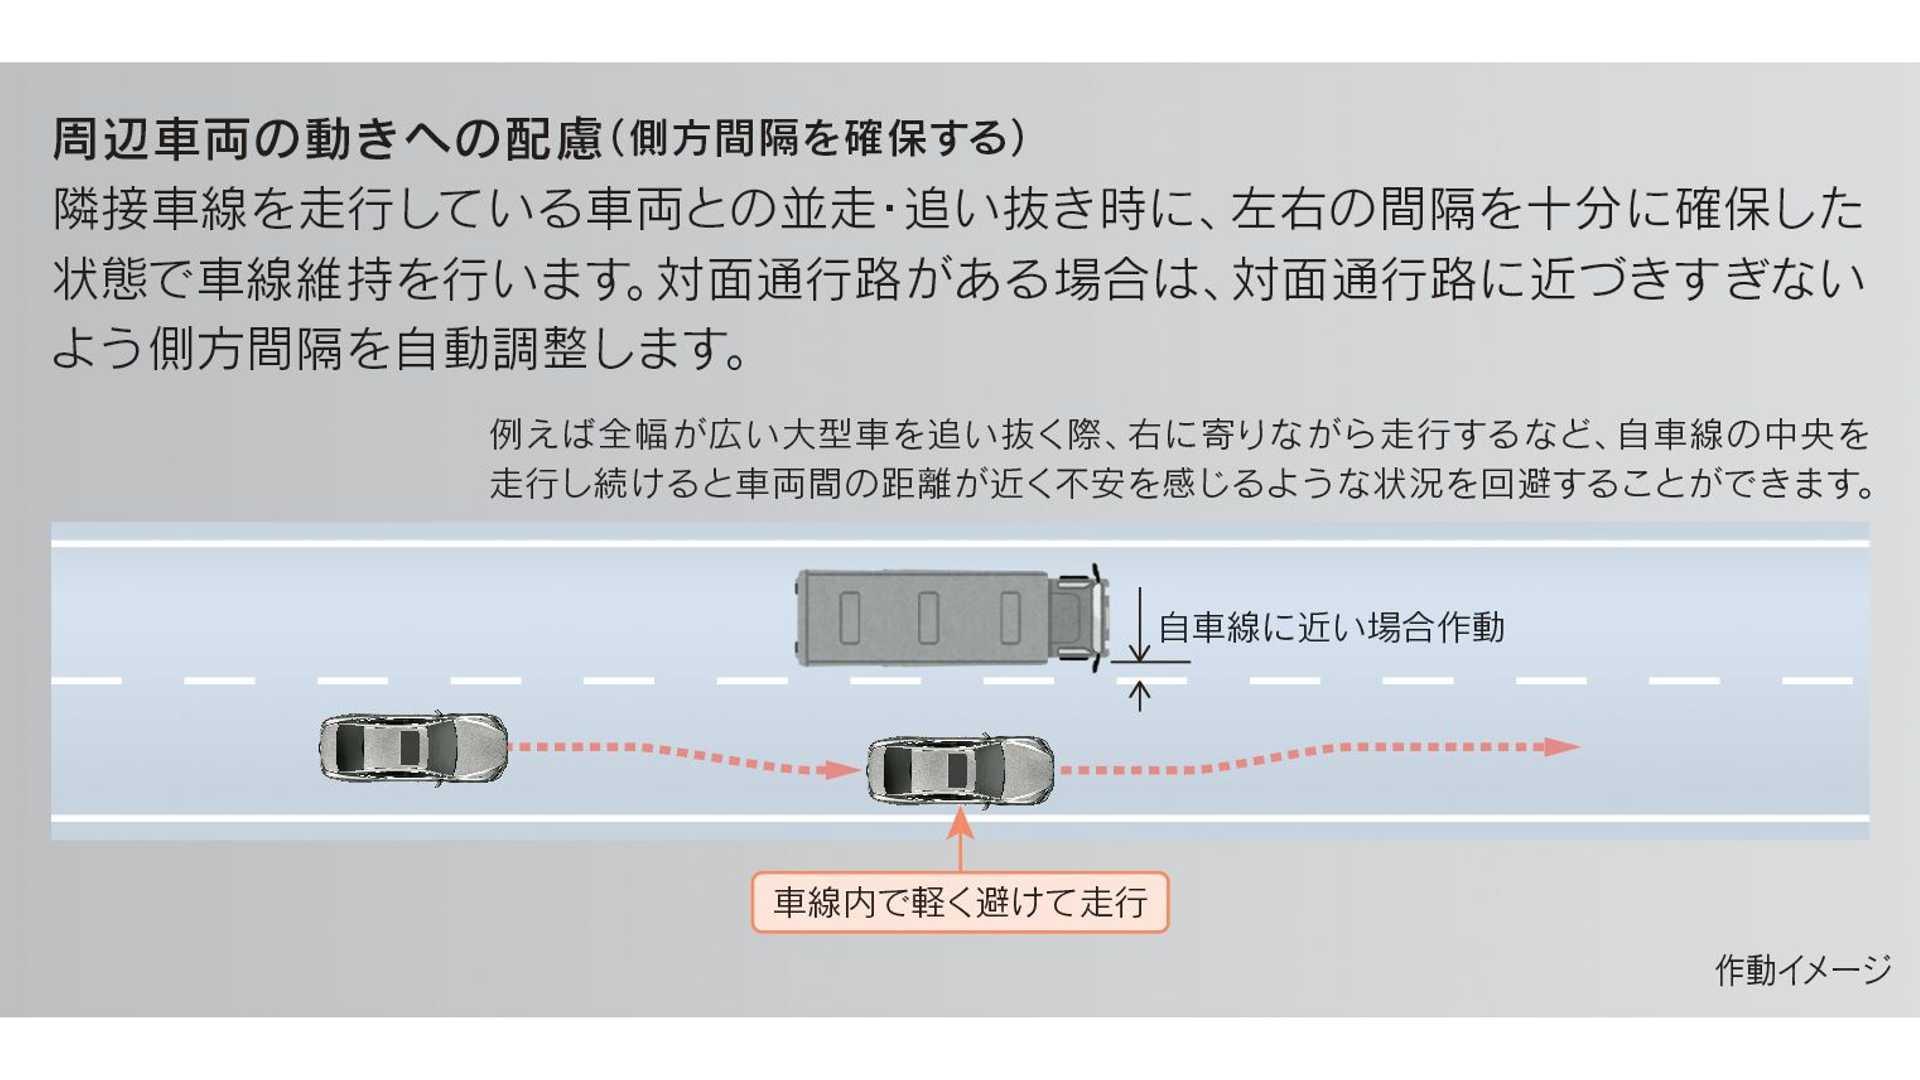 Lexus-LS-And-Toyota-Mirai-Advanced-Drive-33